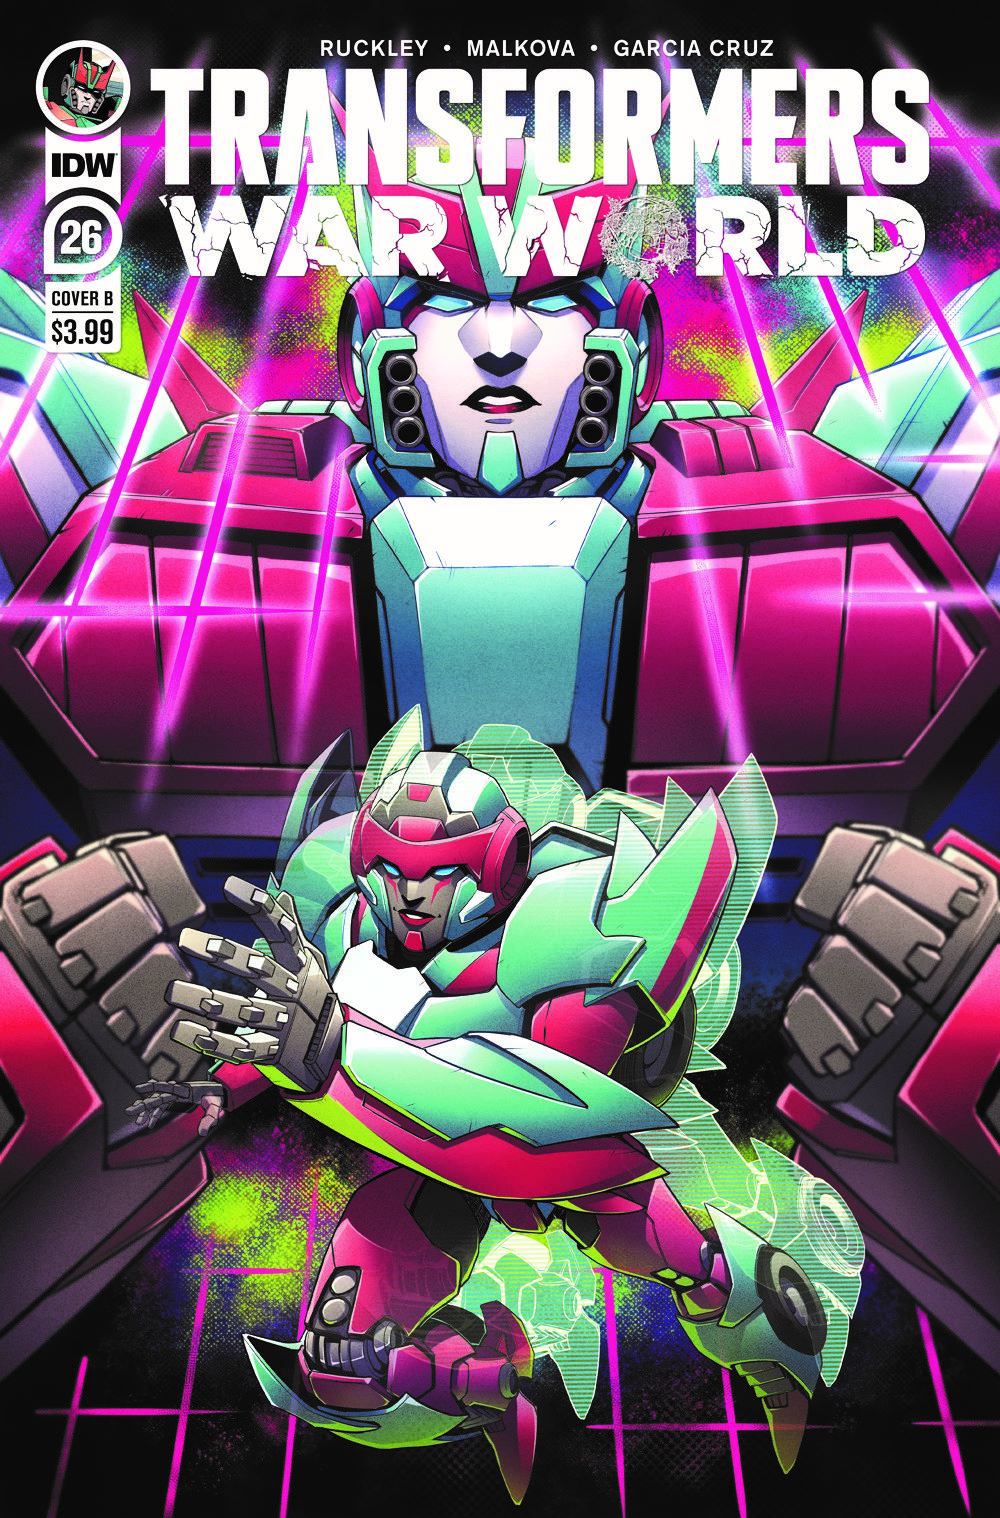 TF26-cvr-B ComicList Previews: TRANSFORMERS #26